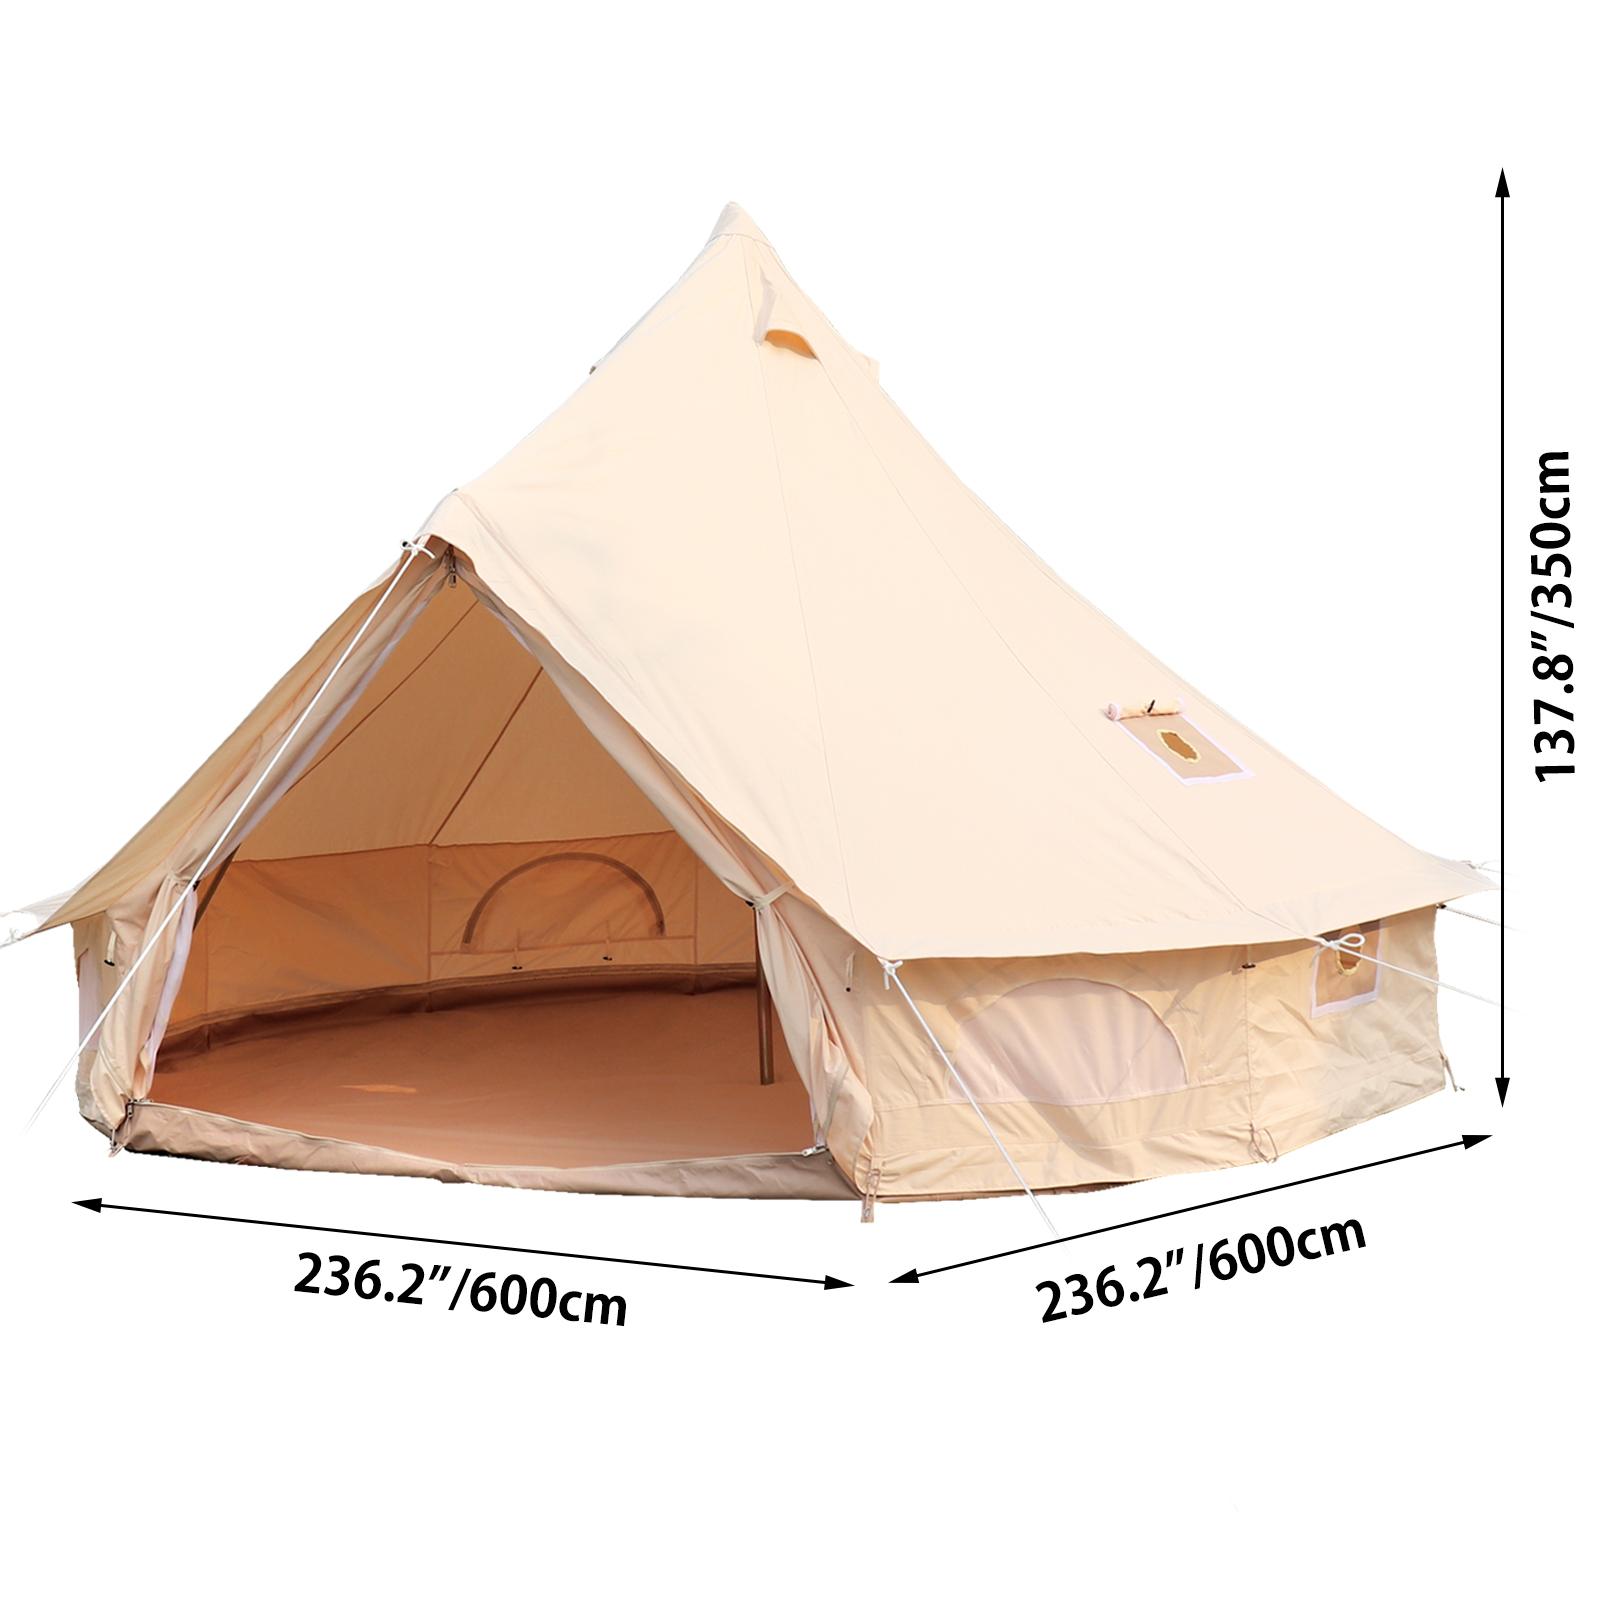 4-Season-Bell-Tent-3-4-5-6M-Waterproof-Cotton-Canvas-Glamping-Camping-Beach-US thumbnail 56